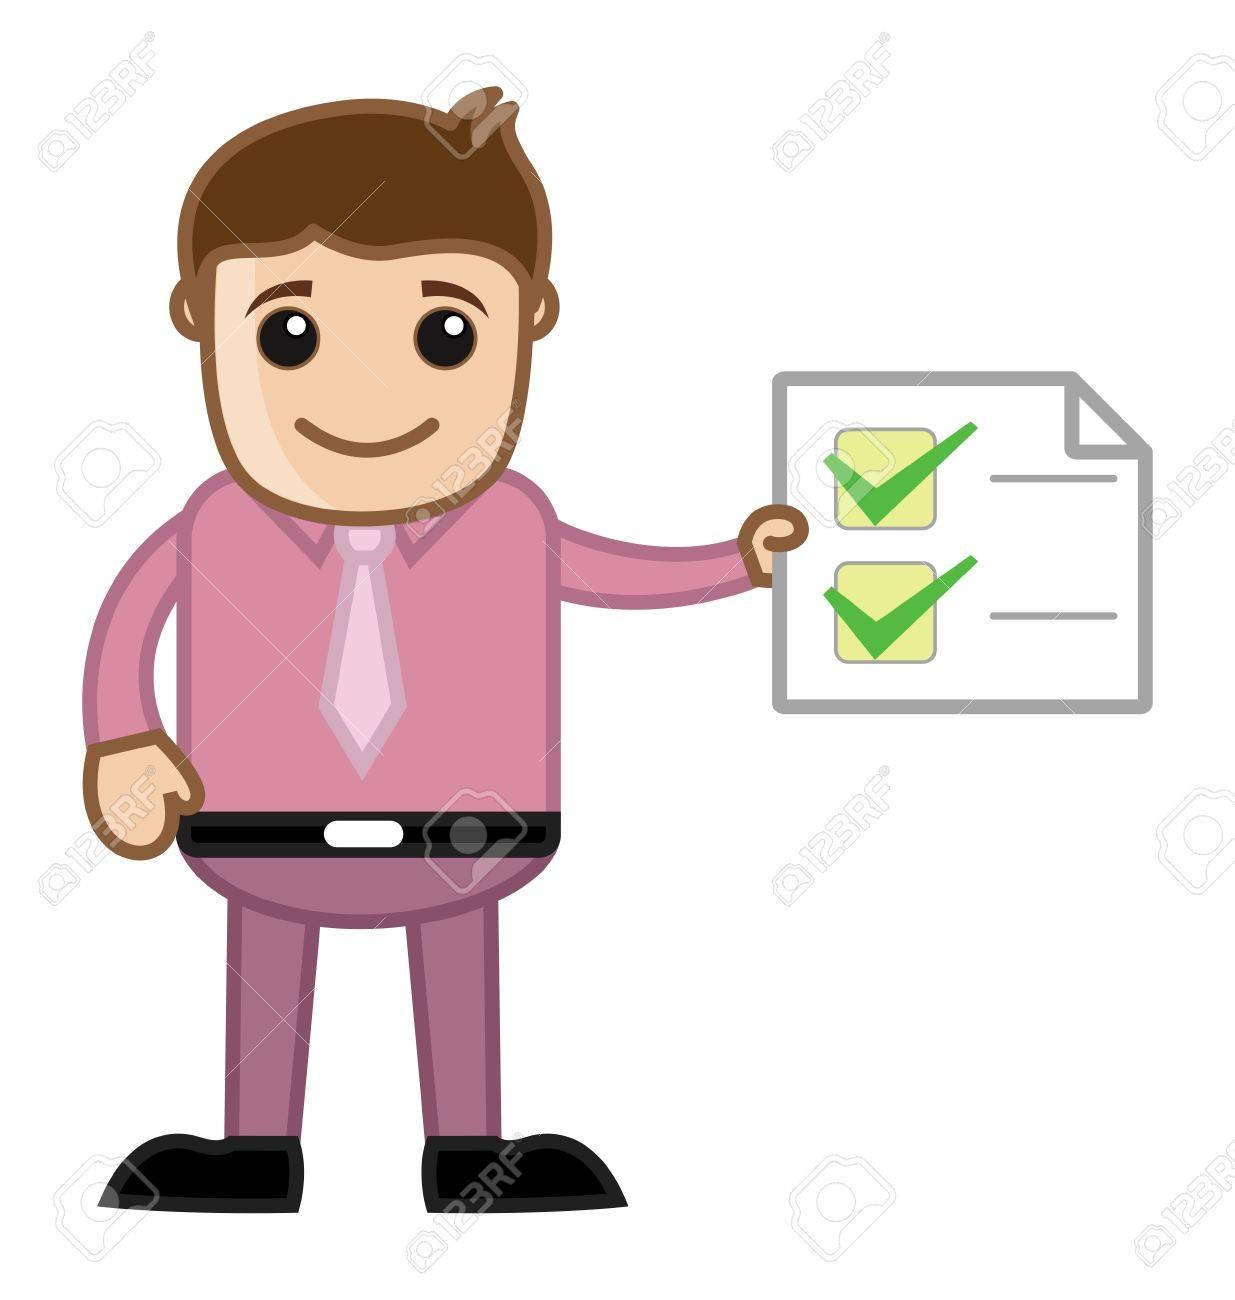 Work Done - Man Holding a Checklist - Business Cartoon Stock Vector - 21983787